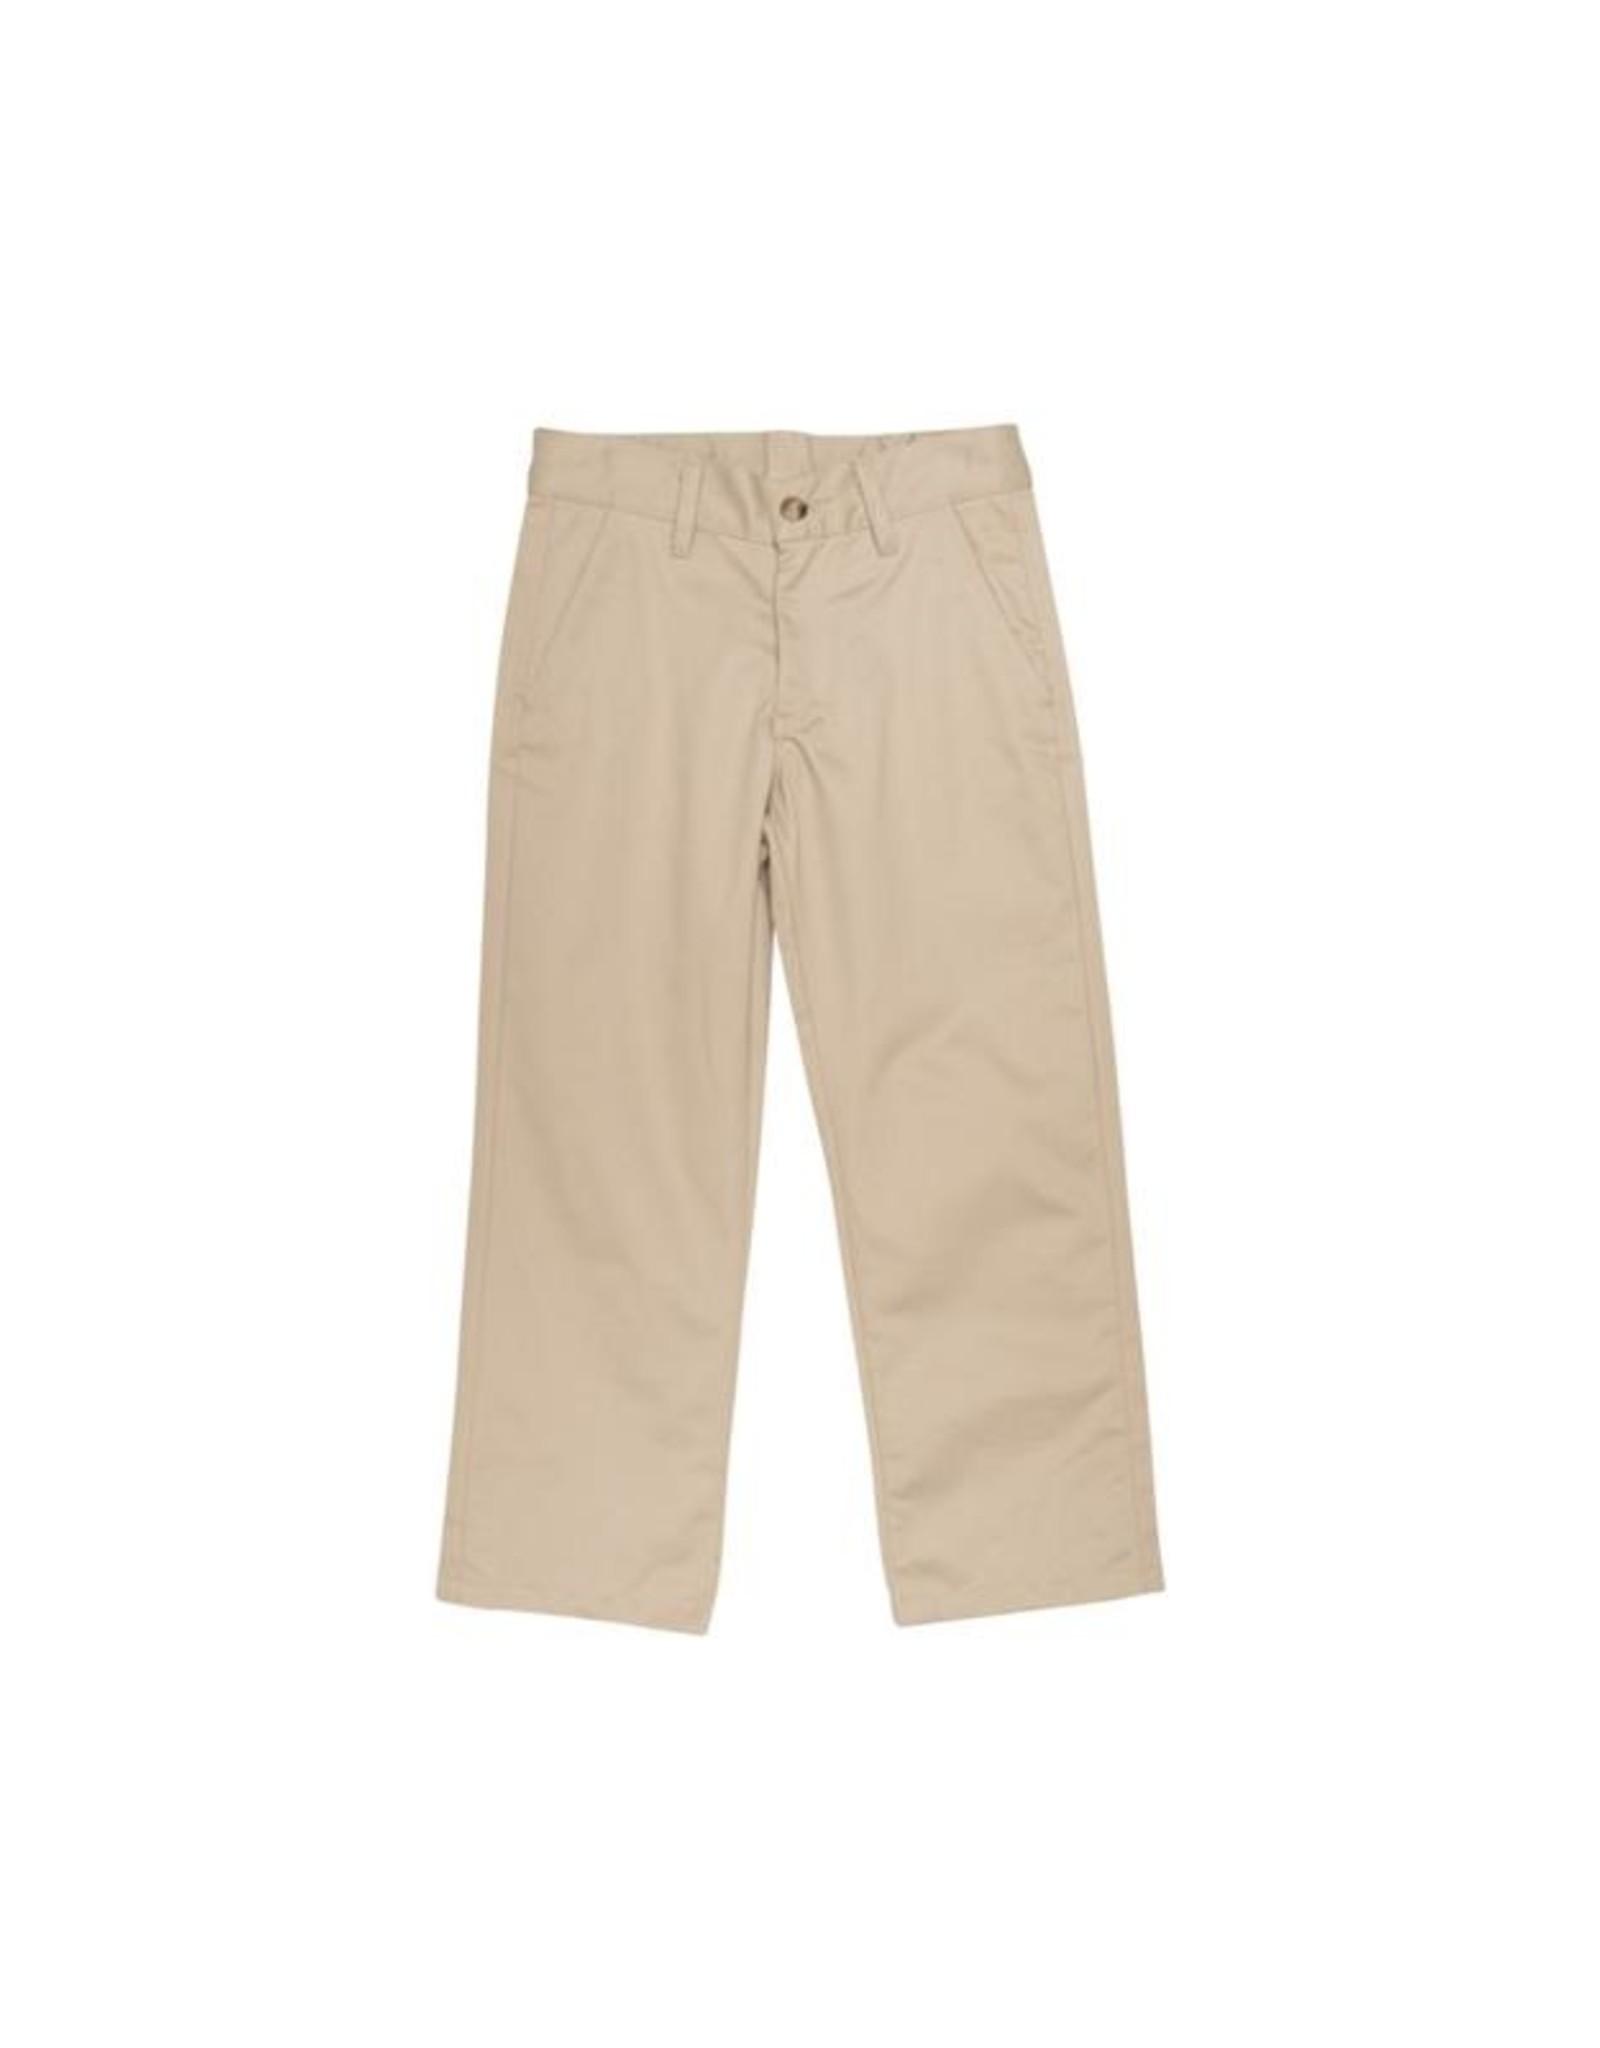 The Beaufort Bonnet Company Prep School Pants Keeneland Khaki Twill